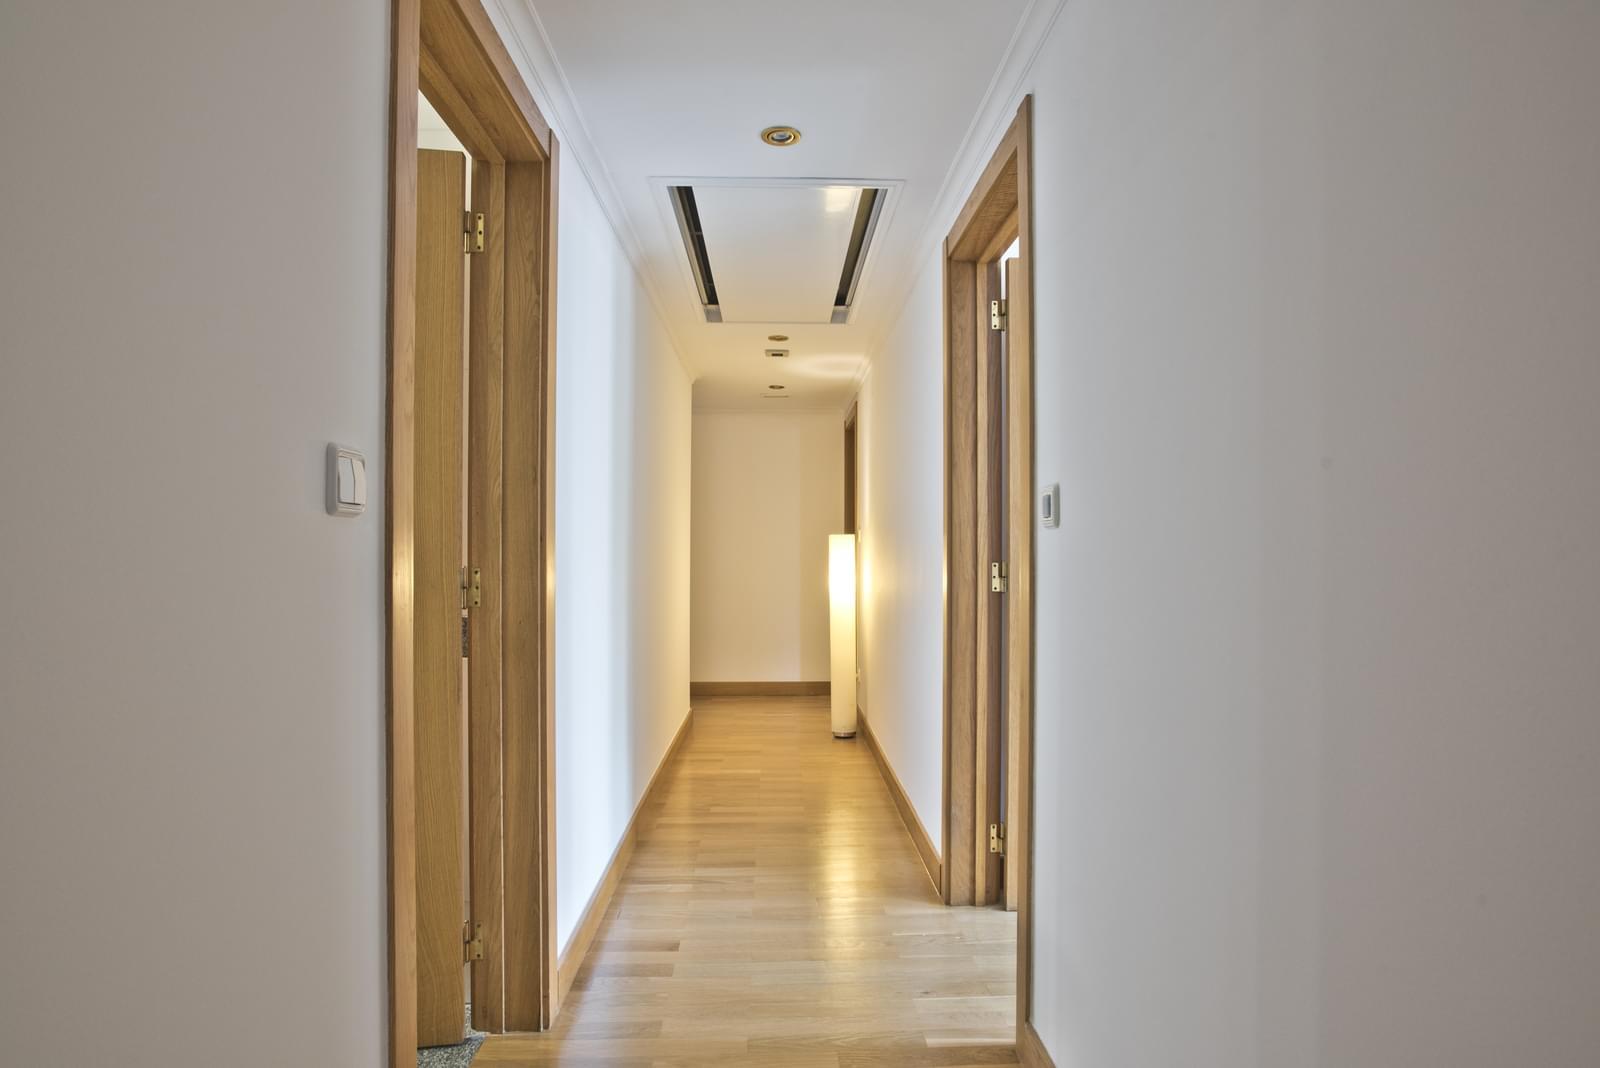 pf17061-apartamento-t3-cascais-af770808-4e94-44c6-ad56-4d4b3dca6d3b